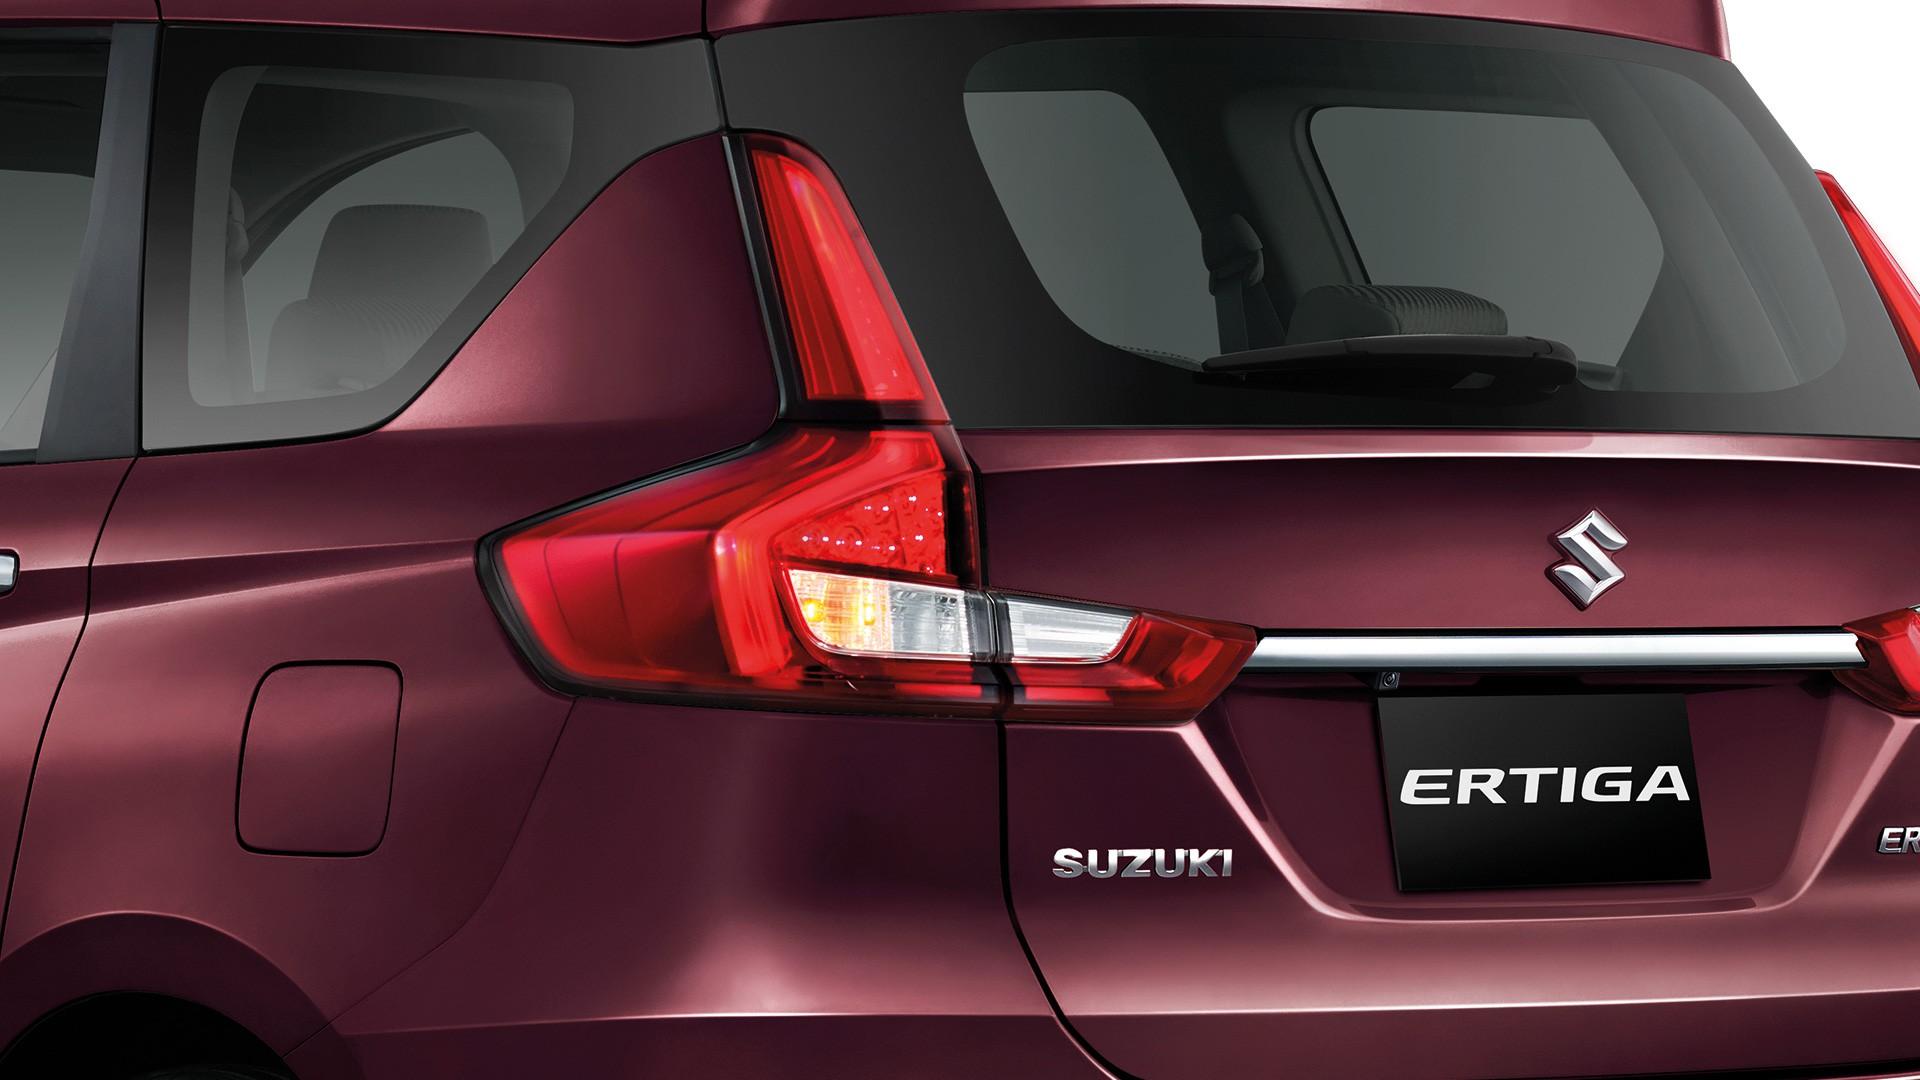 Suzuki ERTIGA ไฟท้าย LED แบบ Light Guides ดีไซน์สปอร์ต